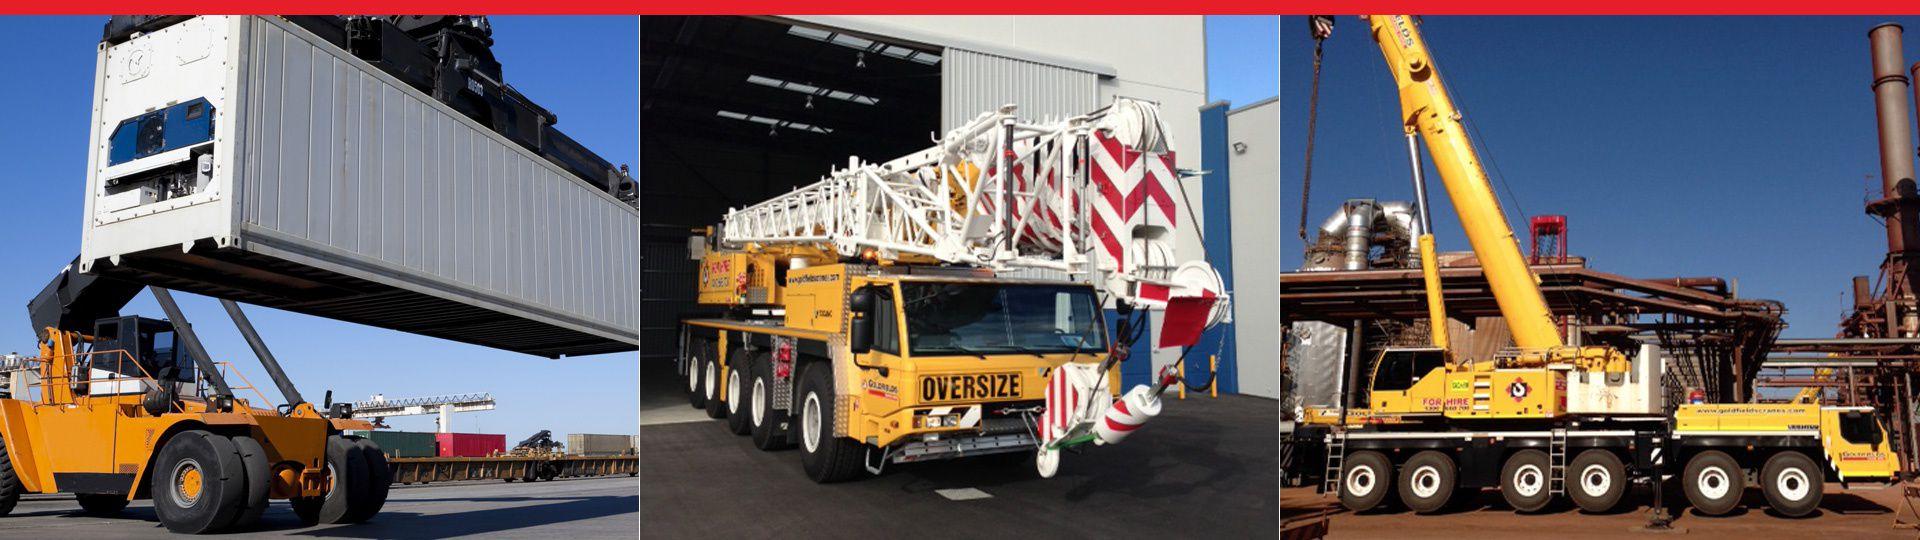 Crane Hire | Western Australia | CraneCorp Australia Pty Ltd